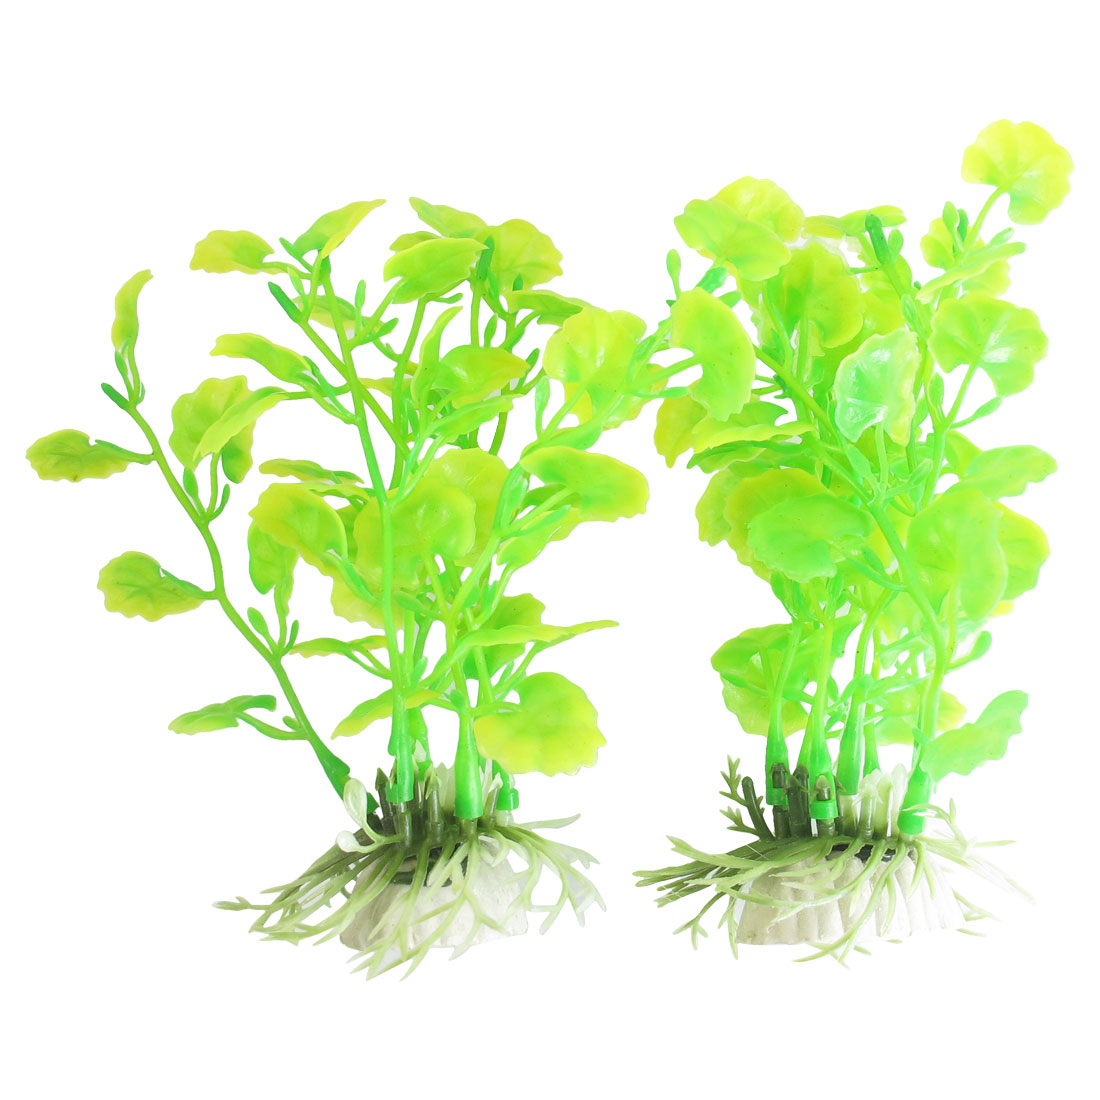 "2 Pcs 5.5"" High Plastic Plants Grass Green Yellow Decor for Fish Tank"